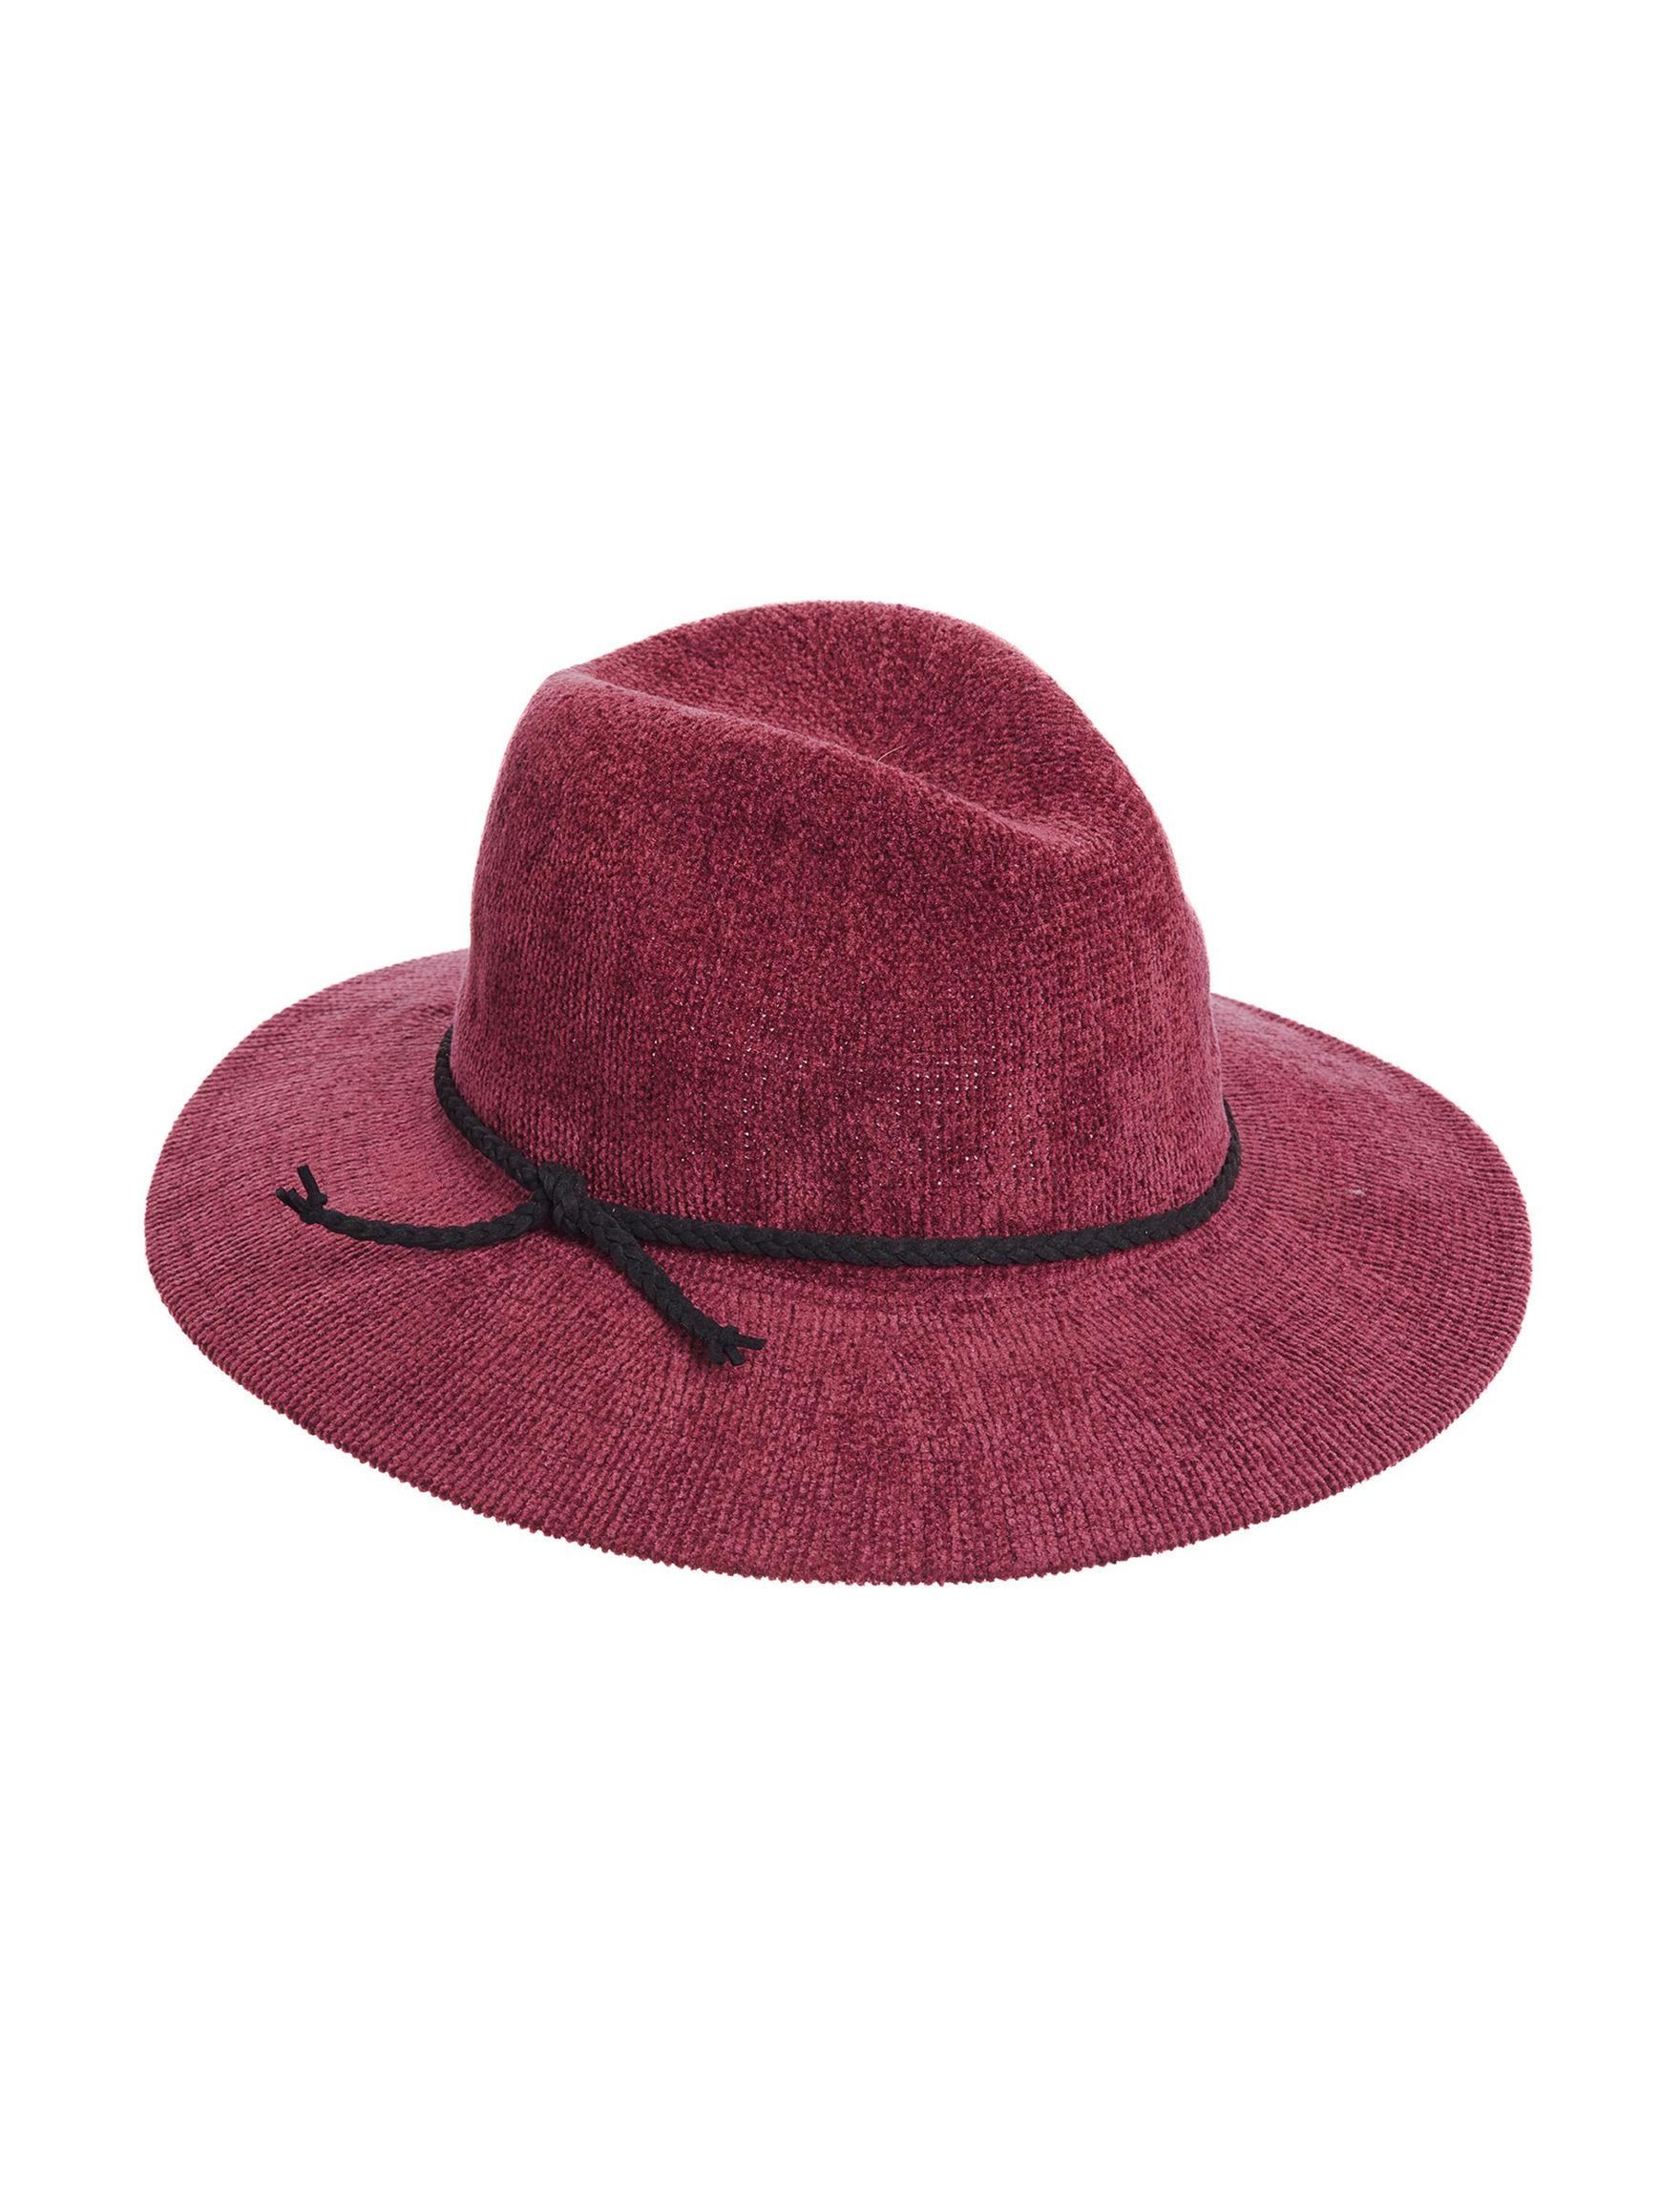 Scala Burgundy Hats & Headwear